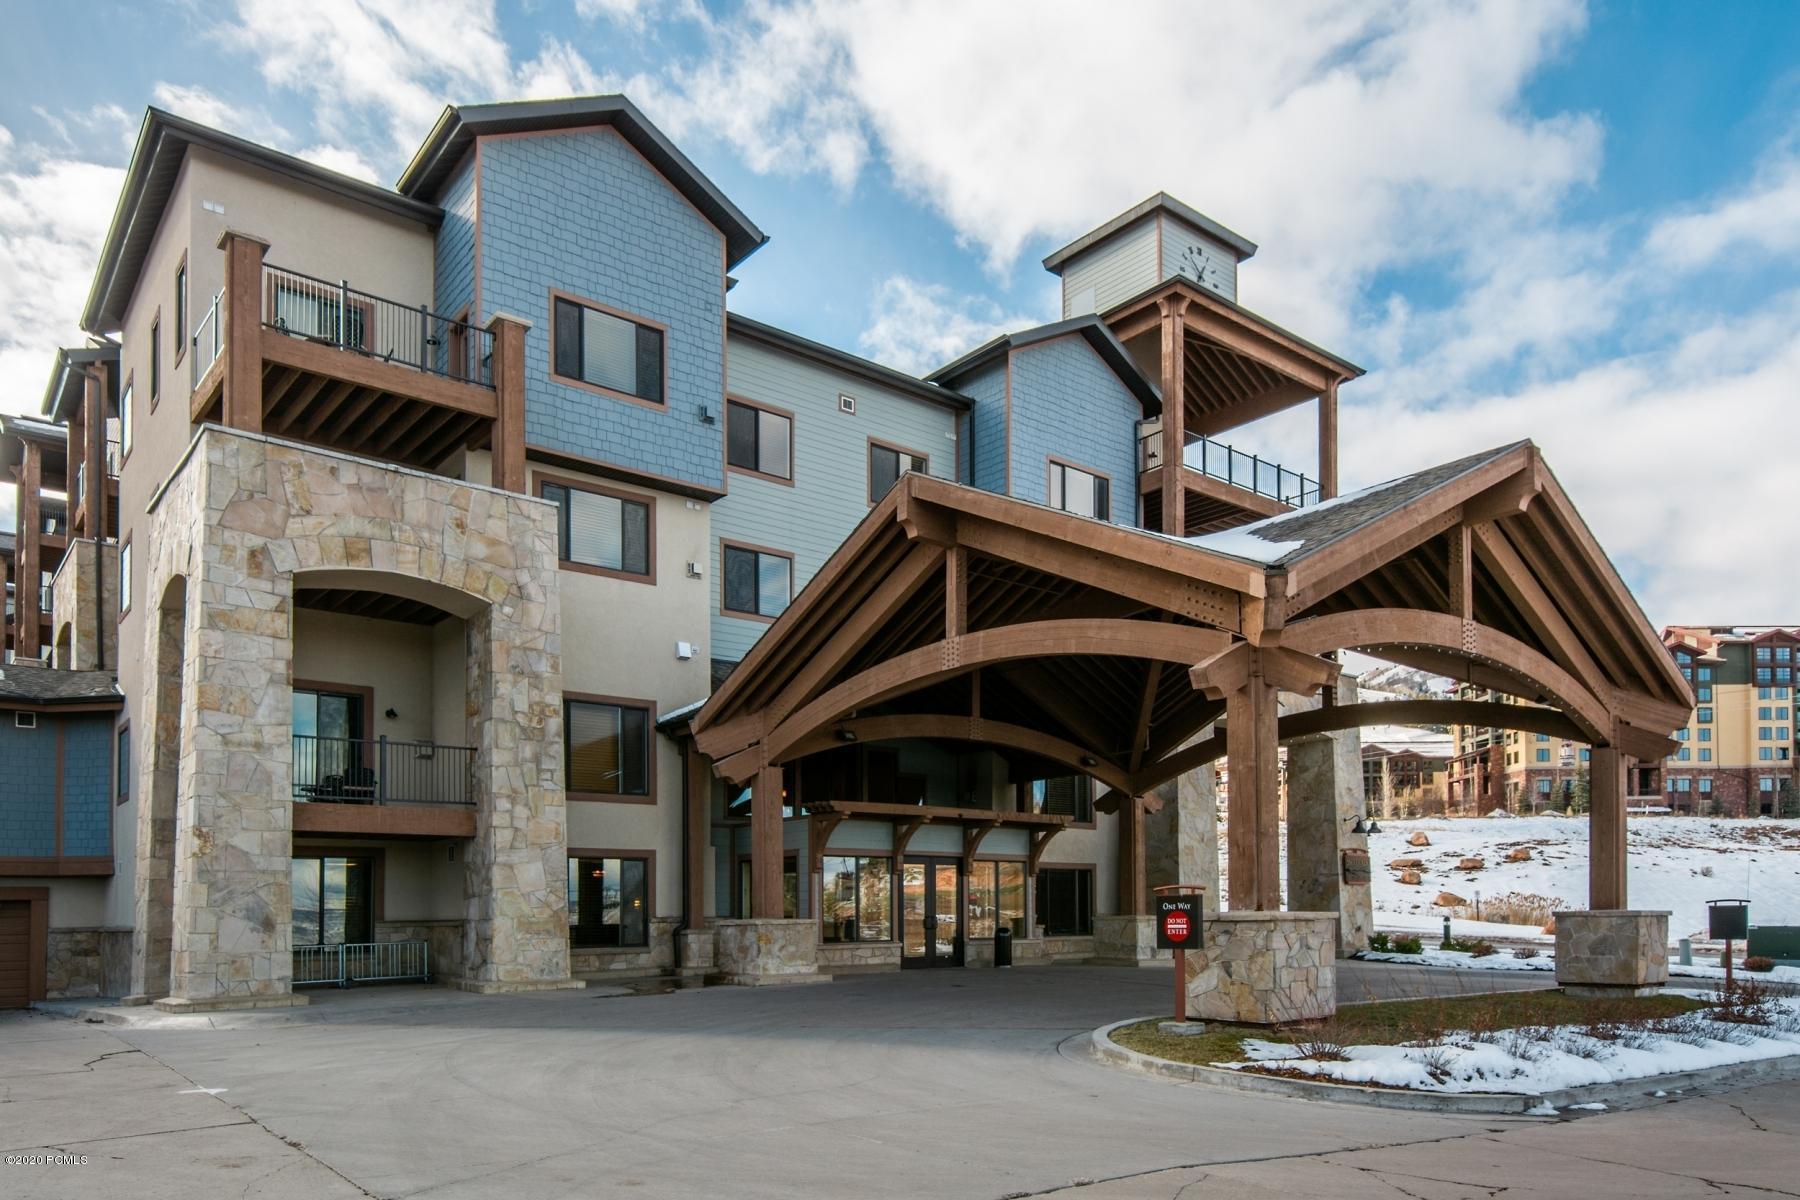 2653 Canyons Resort Drive, Park City, Utah 84098, ,1 BathroomBathrooms,Condominium,For Sale,Canyons Resort,20190109112430415765000000